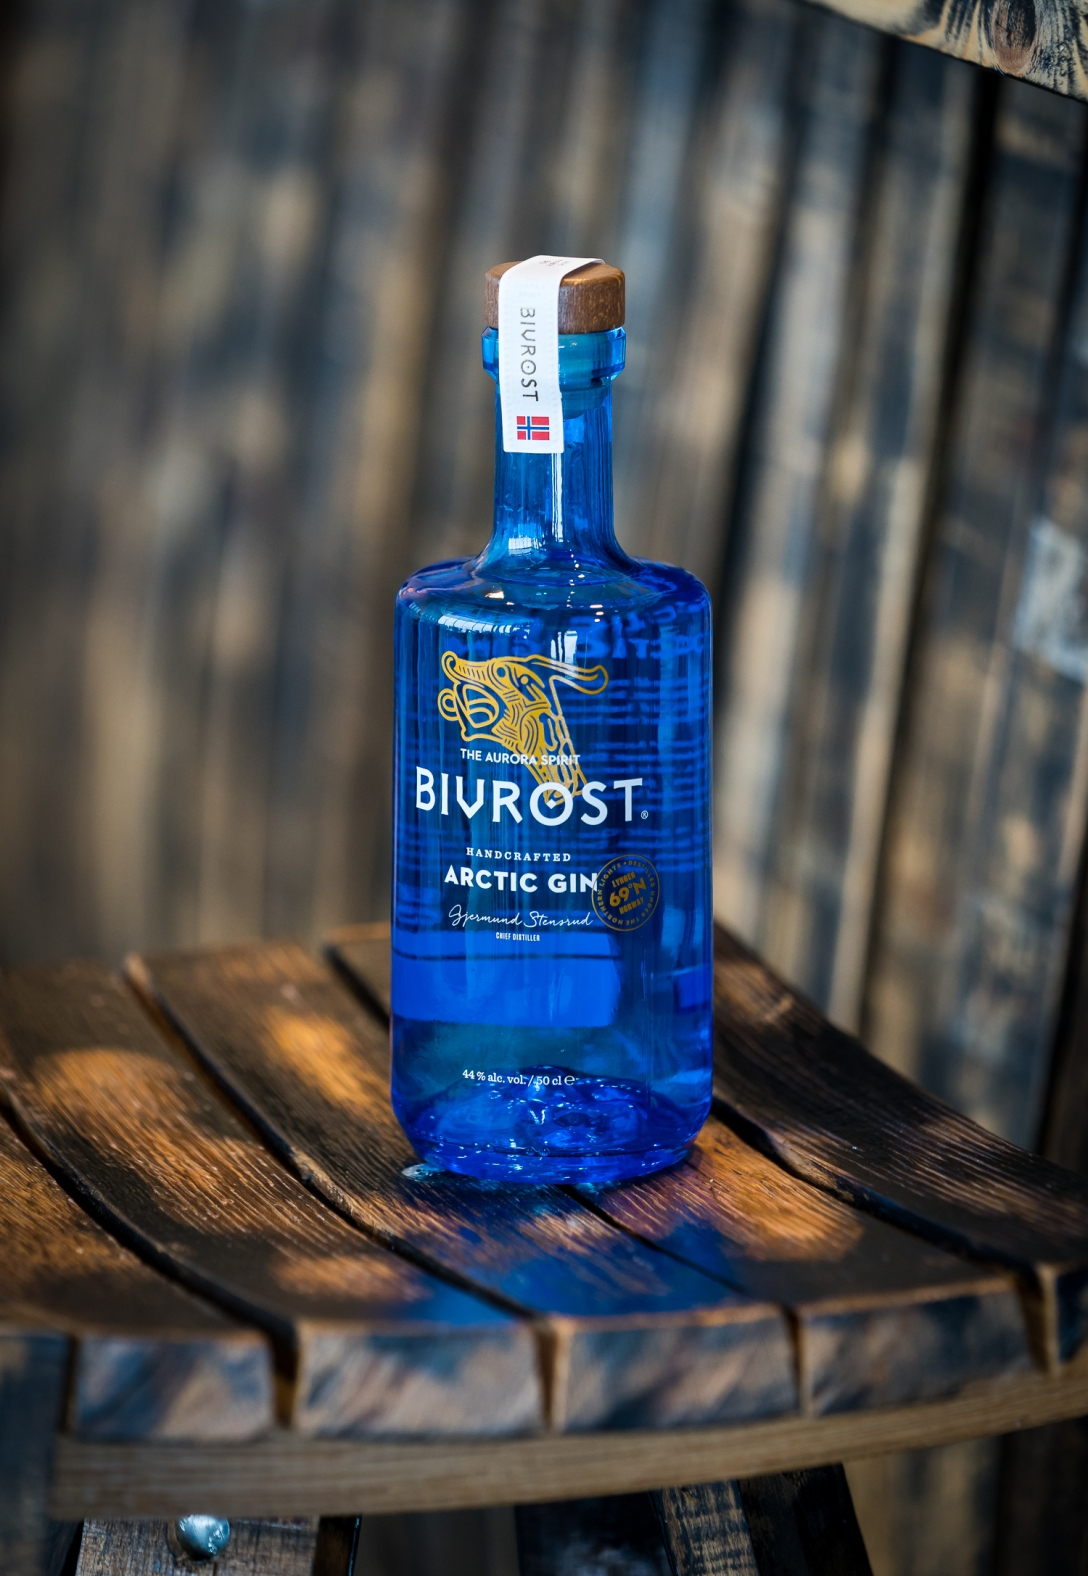 Bivrost Arctic Gin by Aurora Spirits Distillery. Photo by Michael Sperling.